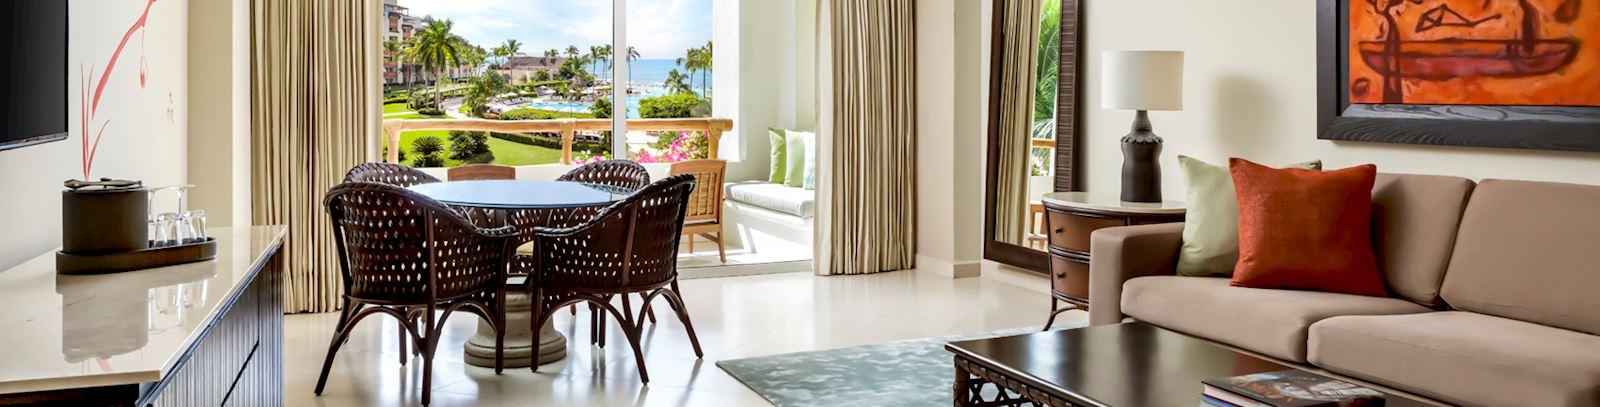 Suite Master Queen en Grand Velas Riviera Nayarit